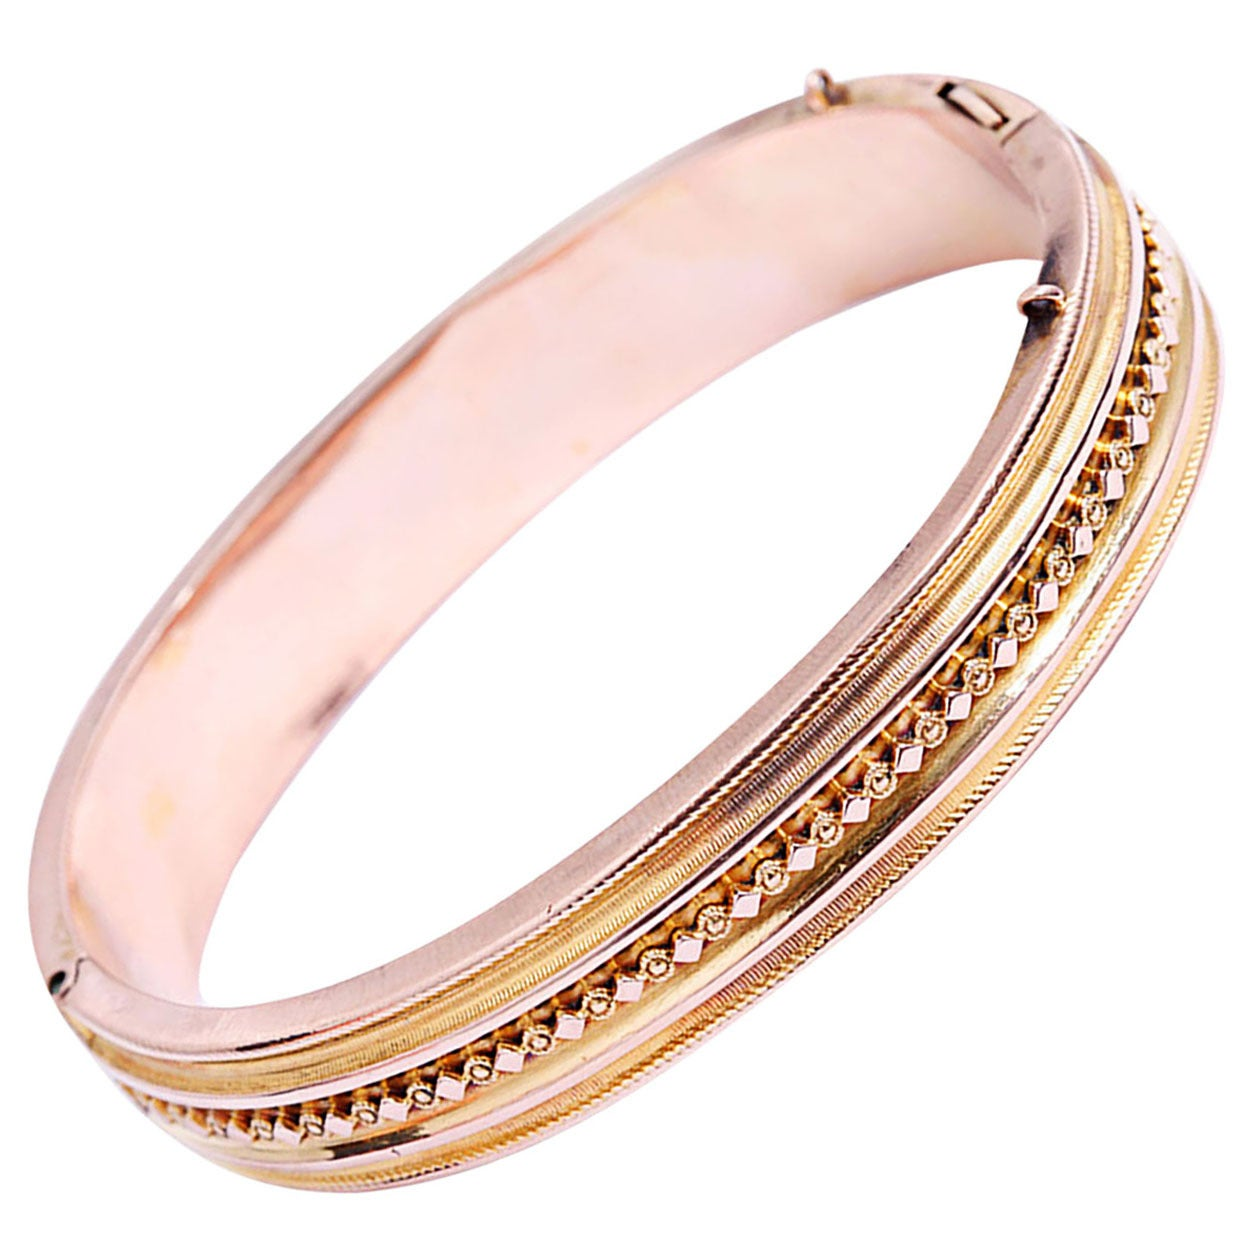 Beautiful Antique Rose Gold Bangle Bracelet For Sale At